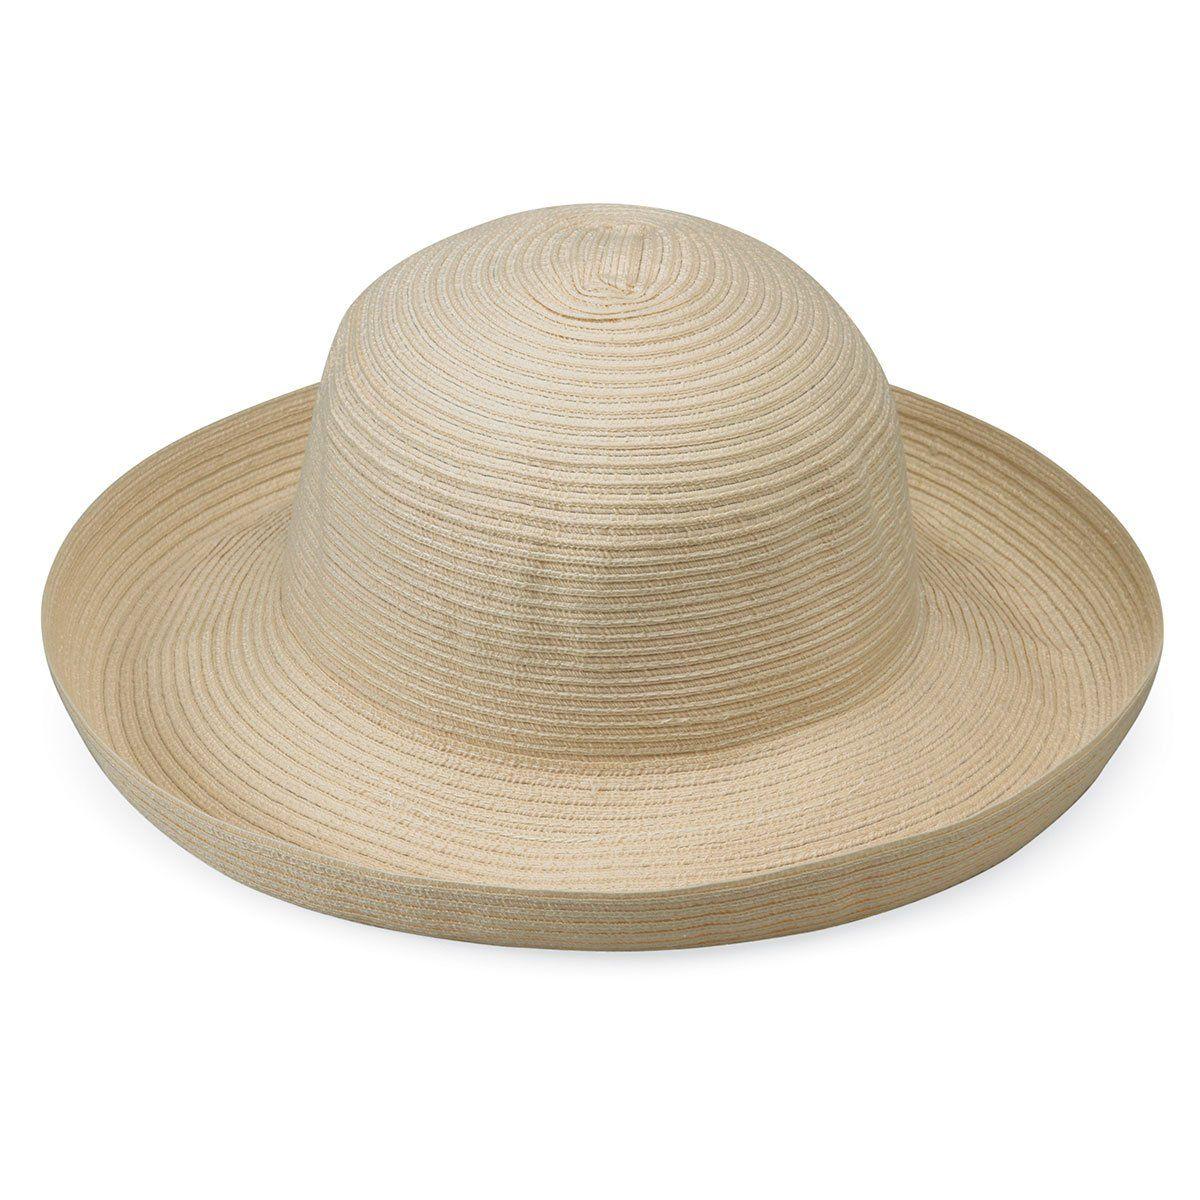 Sydney In 2021 Wallaroo Brim Hat Packable Sun Hat